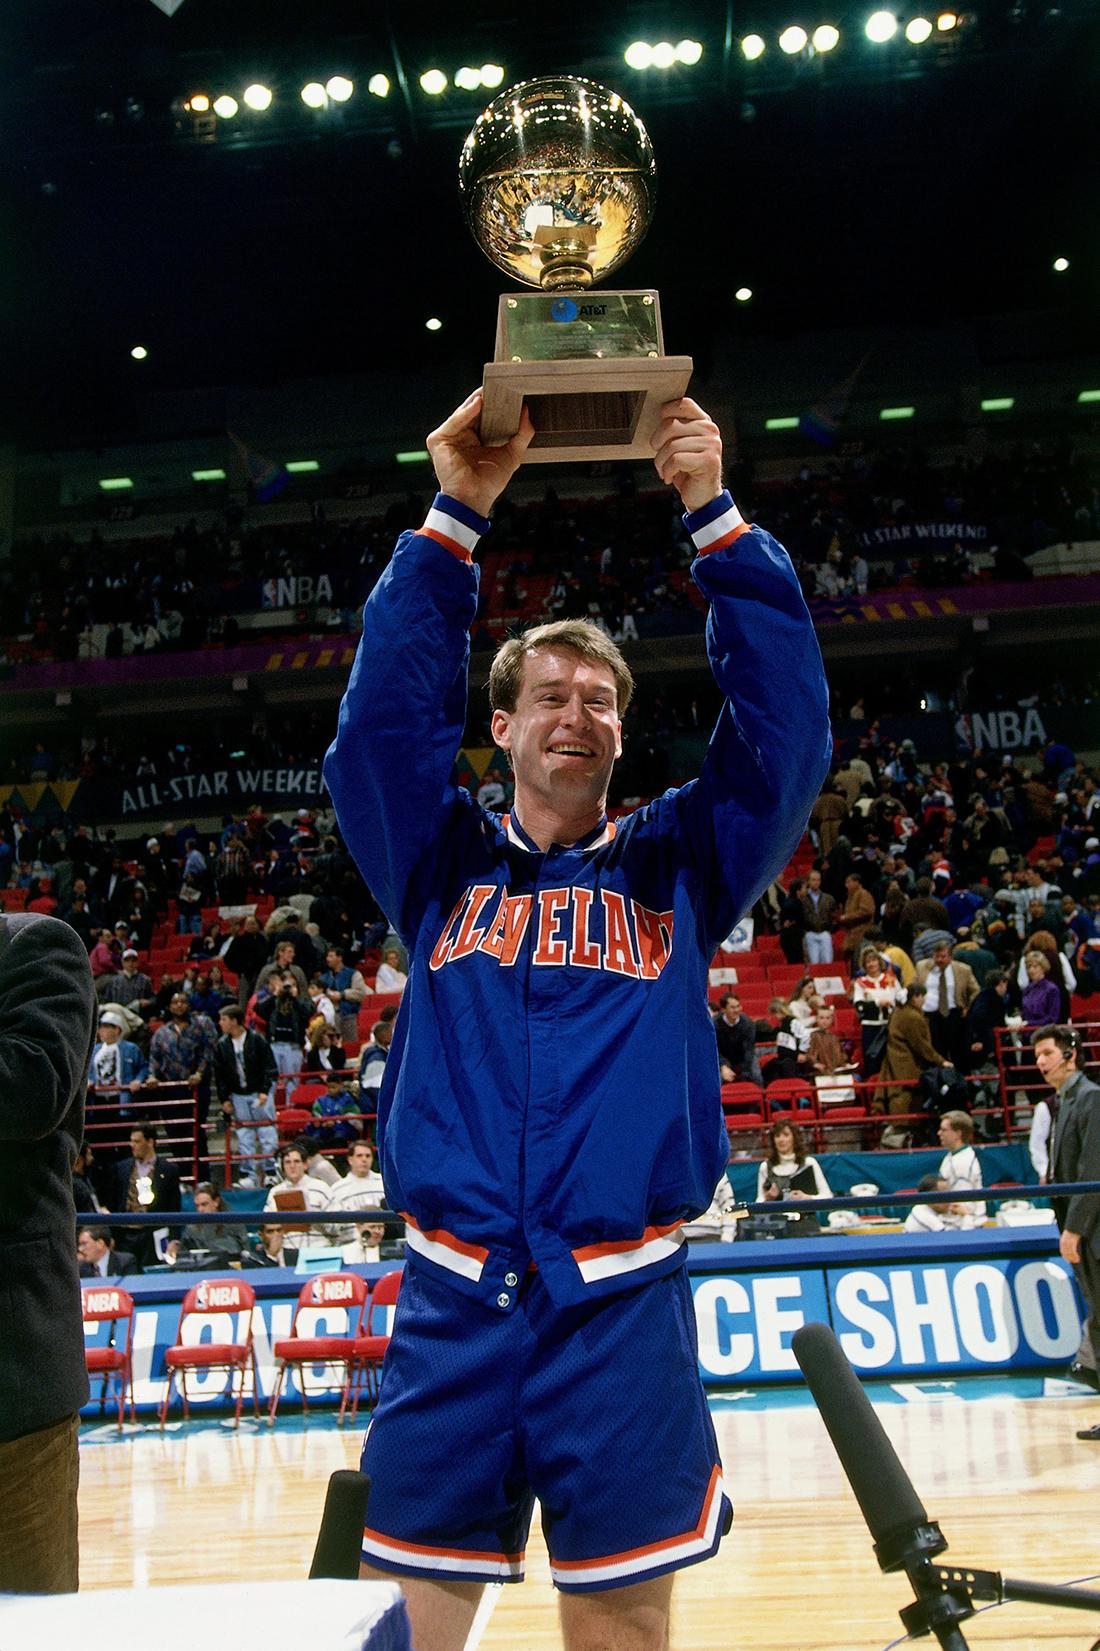 Mark Price ganador en concurso de tres puntos en viva basquet